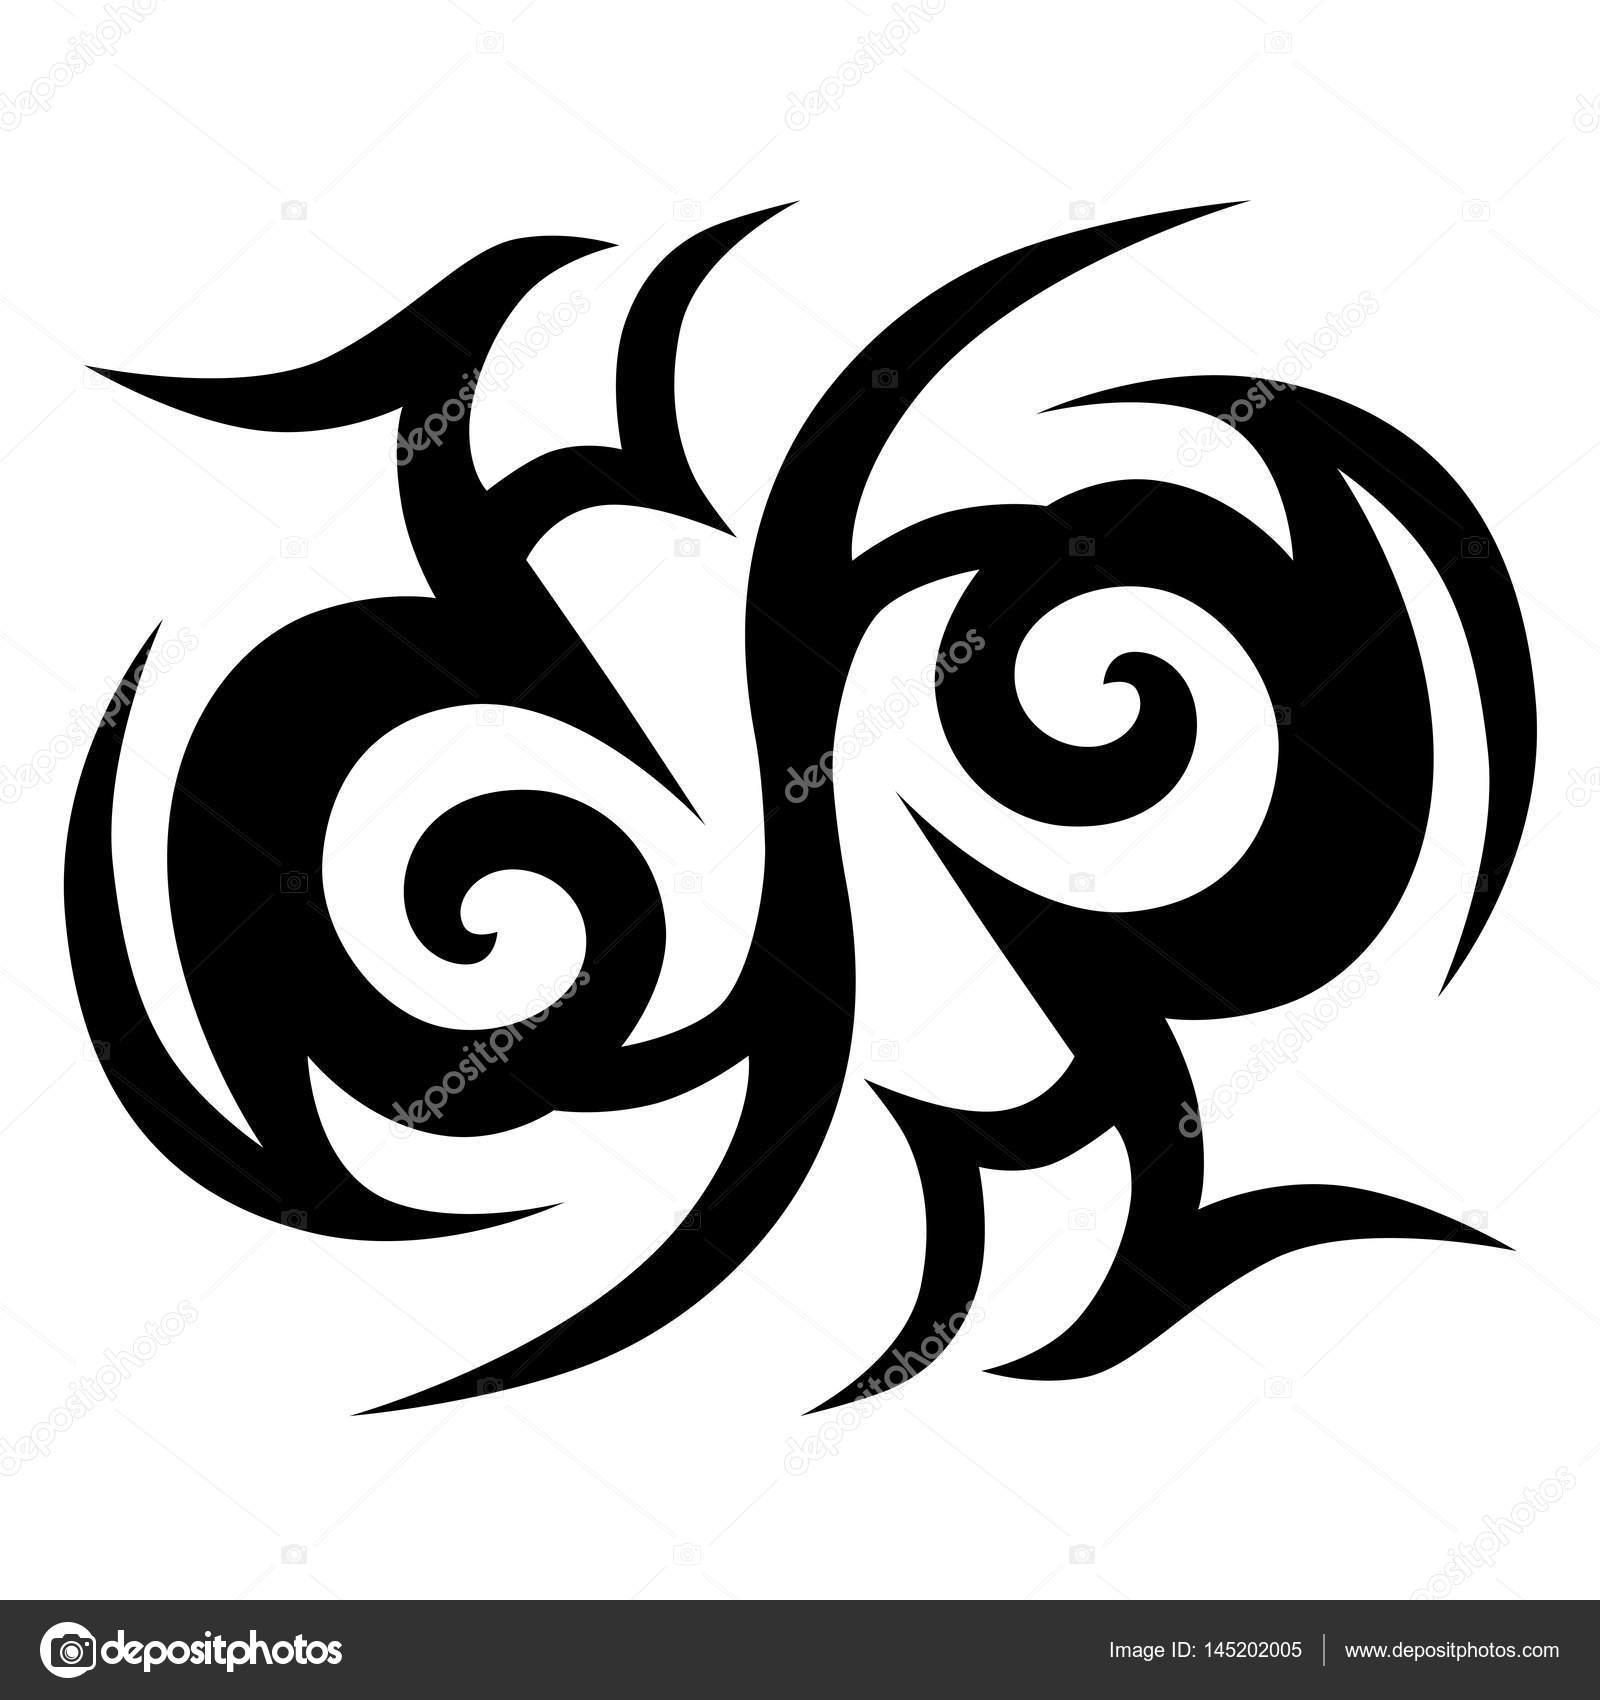 Tribal Ontwerpen Tribal Tattoos Tribal Tattoo Art Stockvector